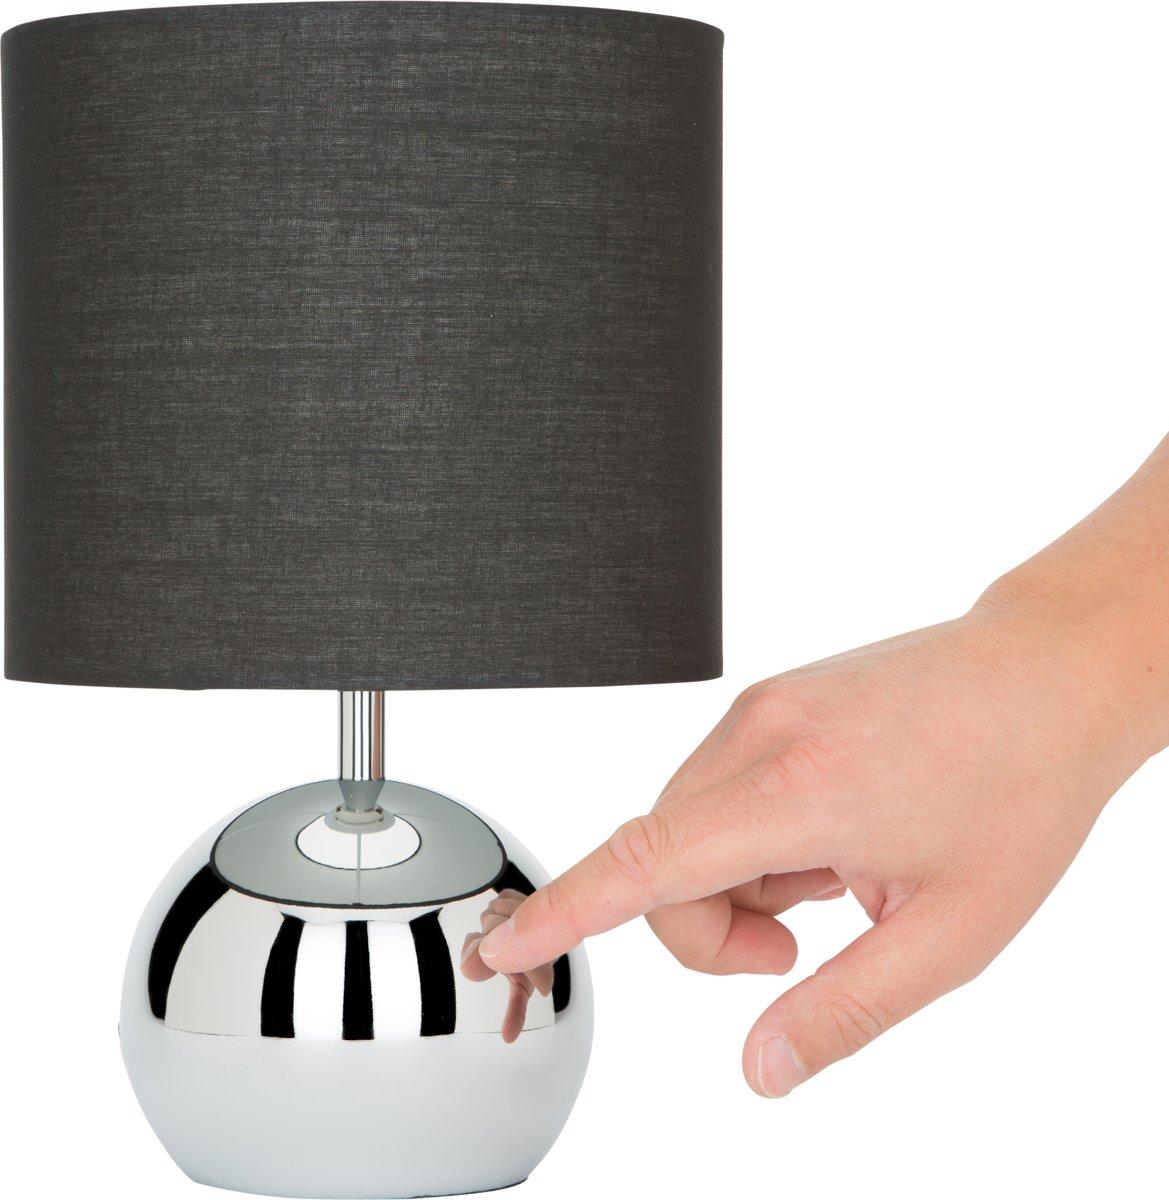 bol.com | Tafellamp kopen? Alle Tafellampen online